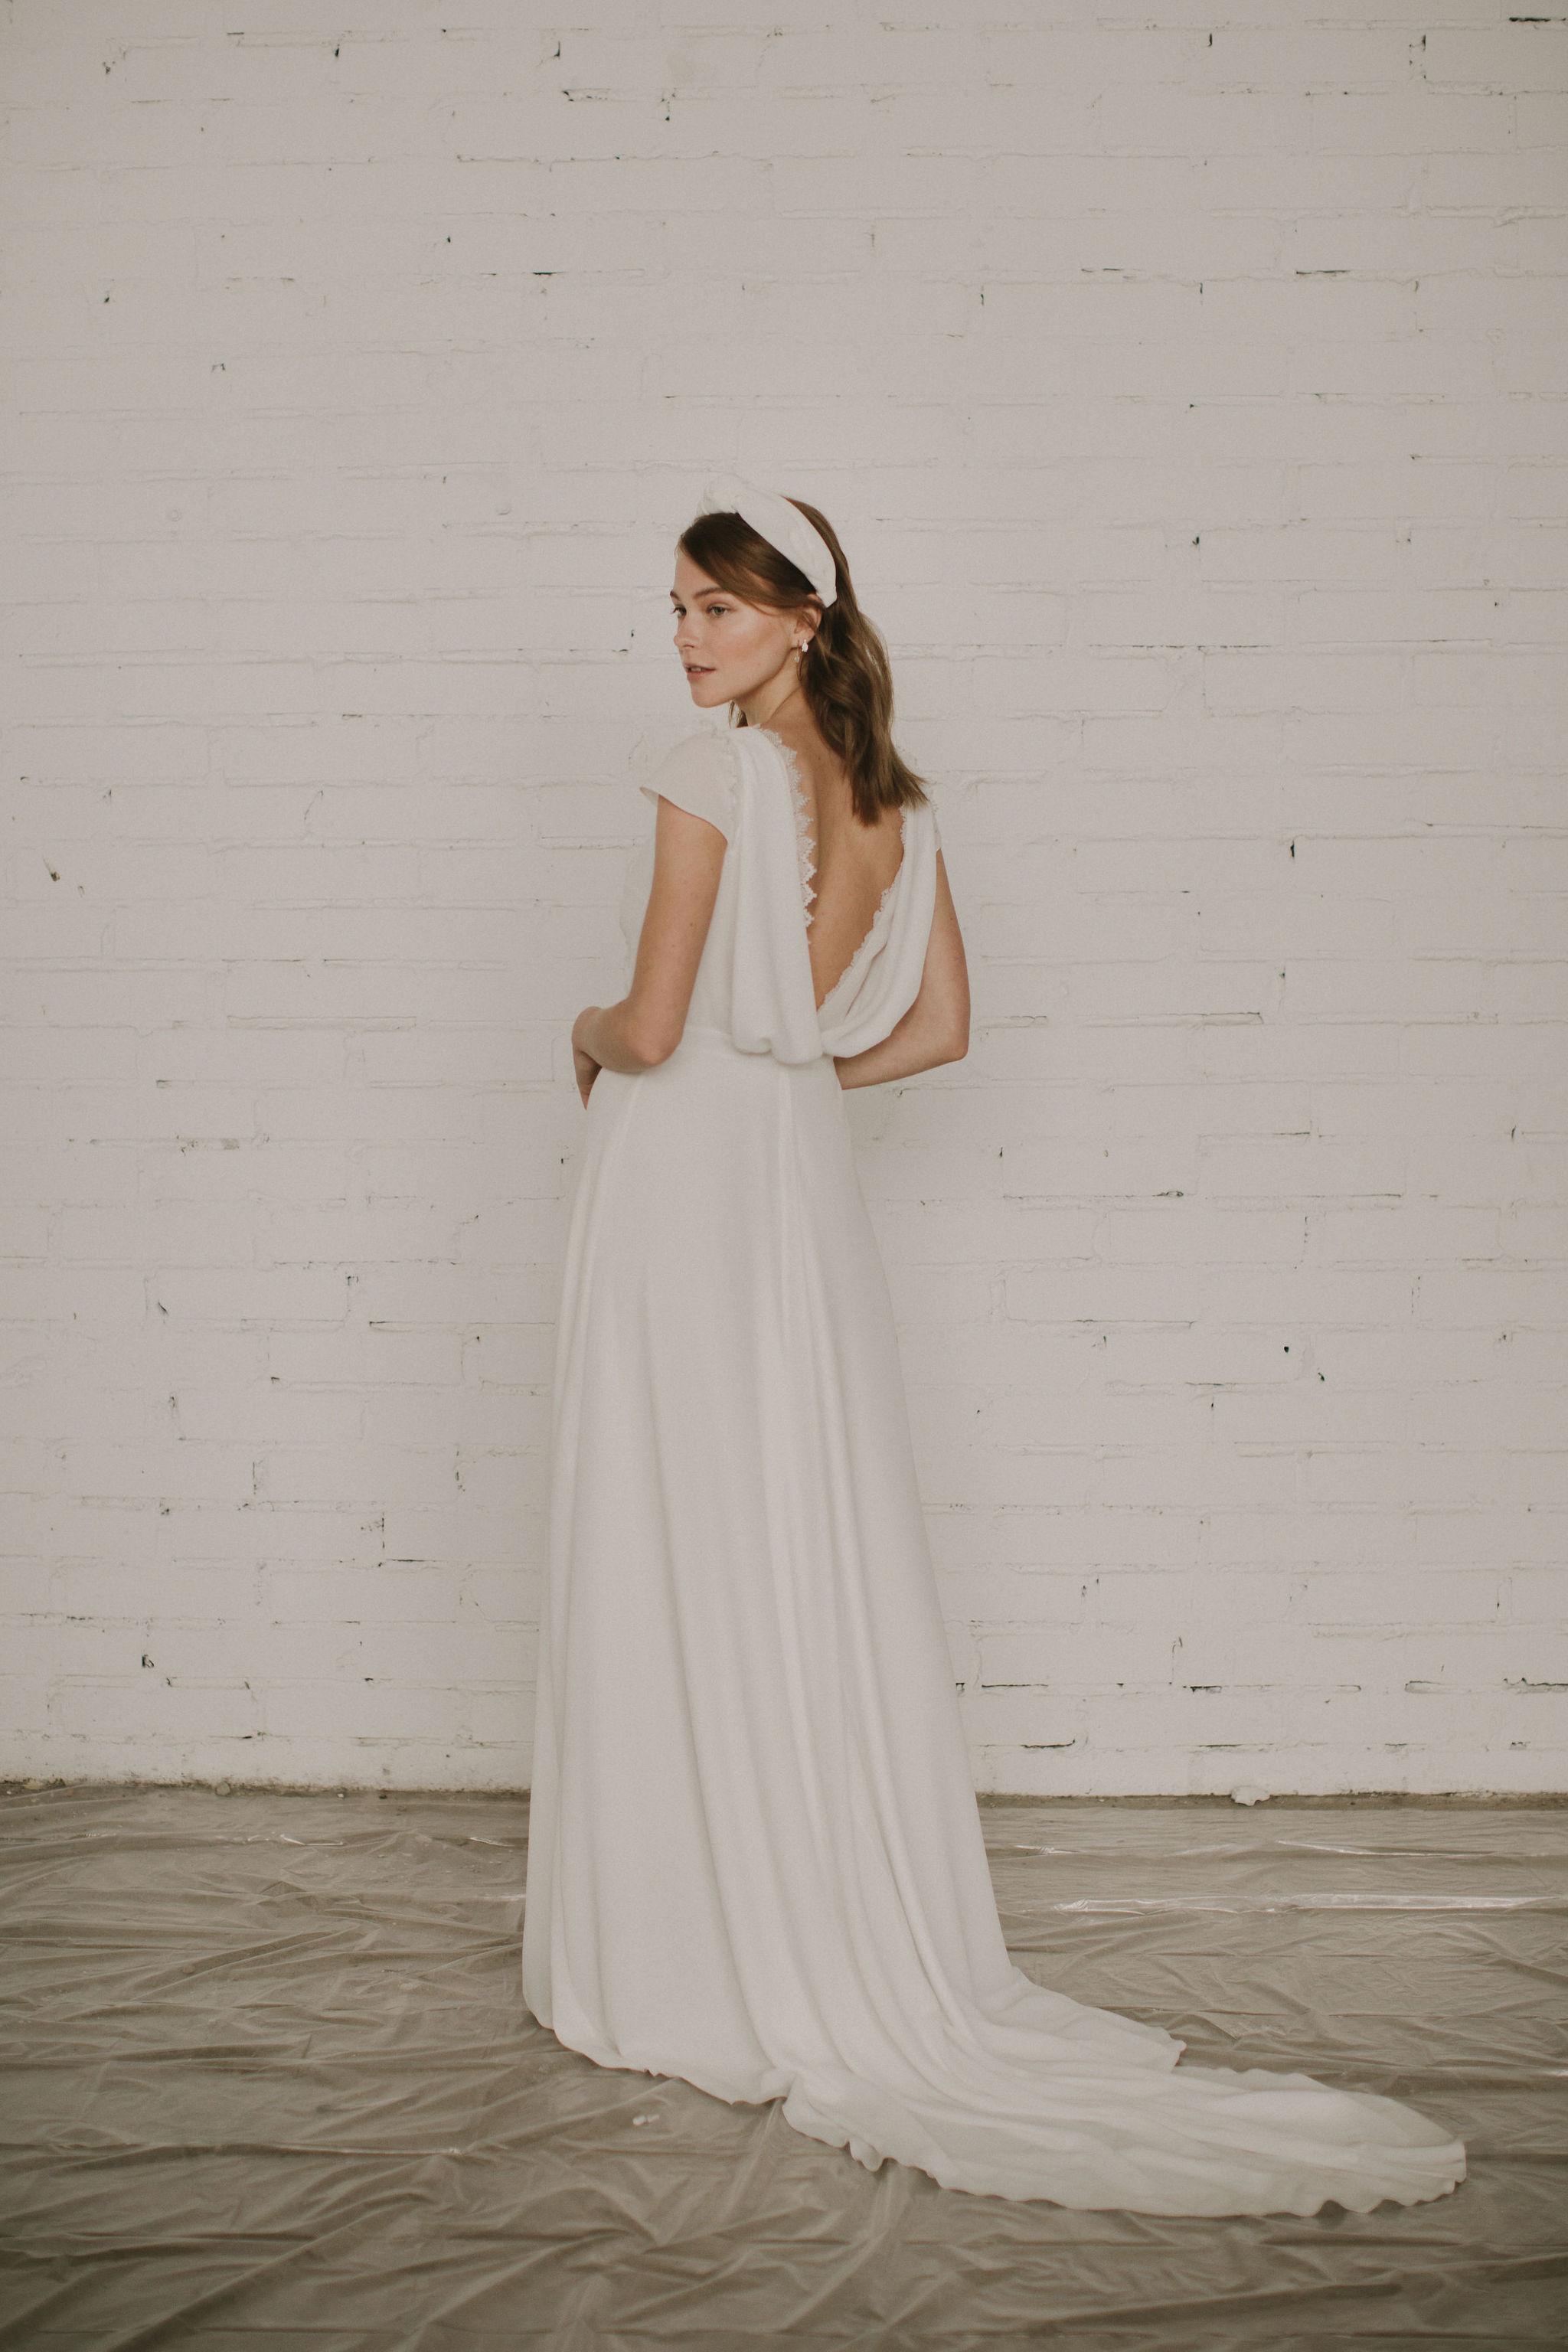 modern romantic wedding dress collection by Otaduy